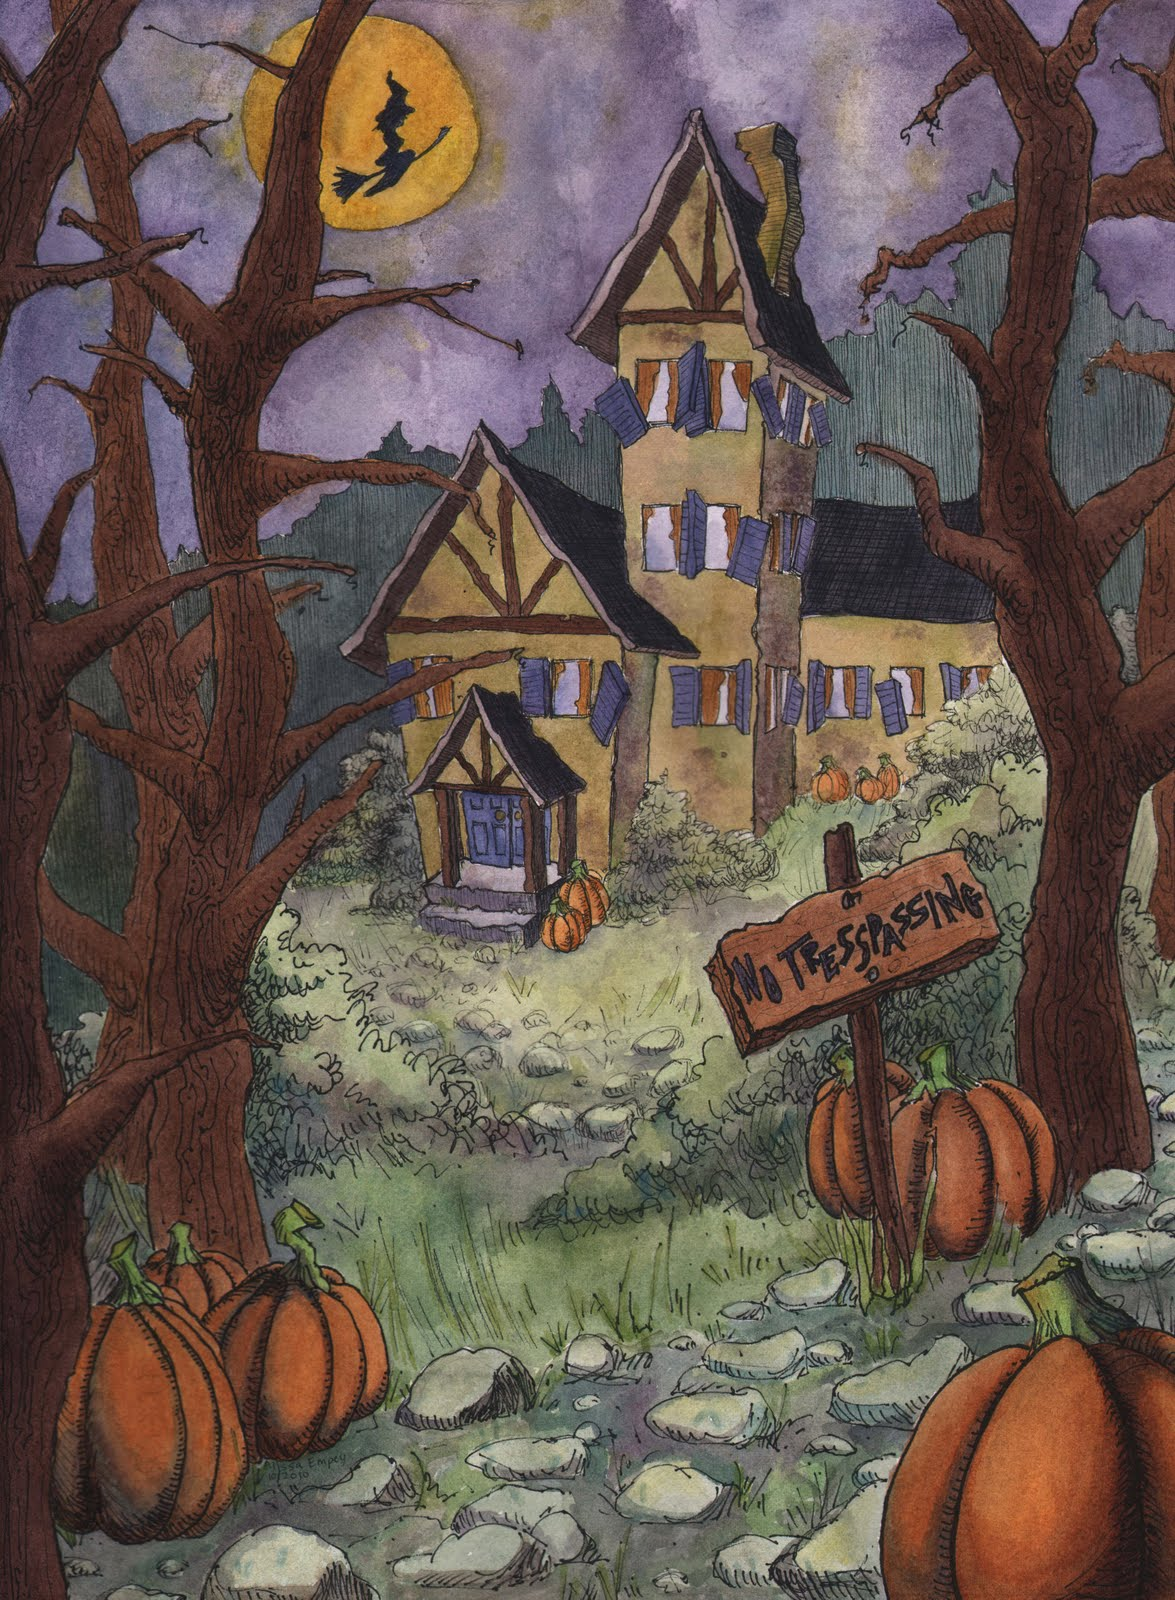 http://2.bp.blogspot.com/_fwAKRYrYfXw/TLtE3uHKNPI/AAAAAAAABes/nfoSsxe7OTA/s1600/Halloween+Painting+Revised+web.jpg